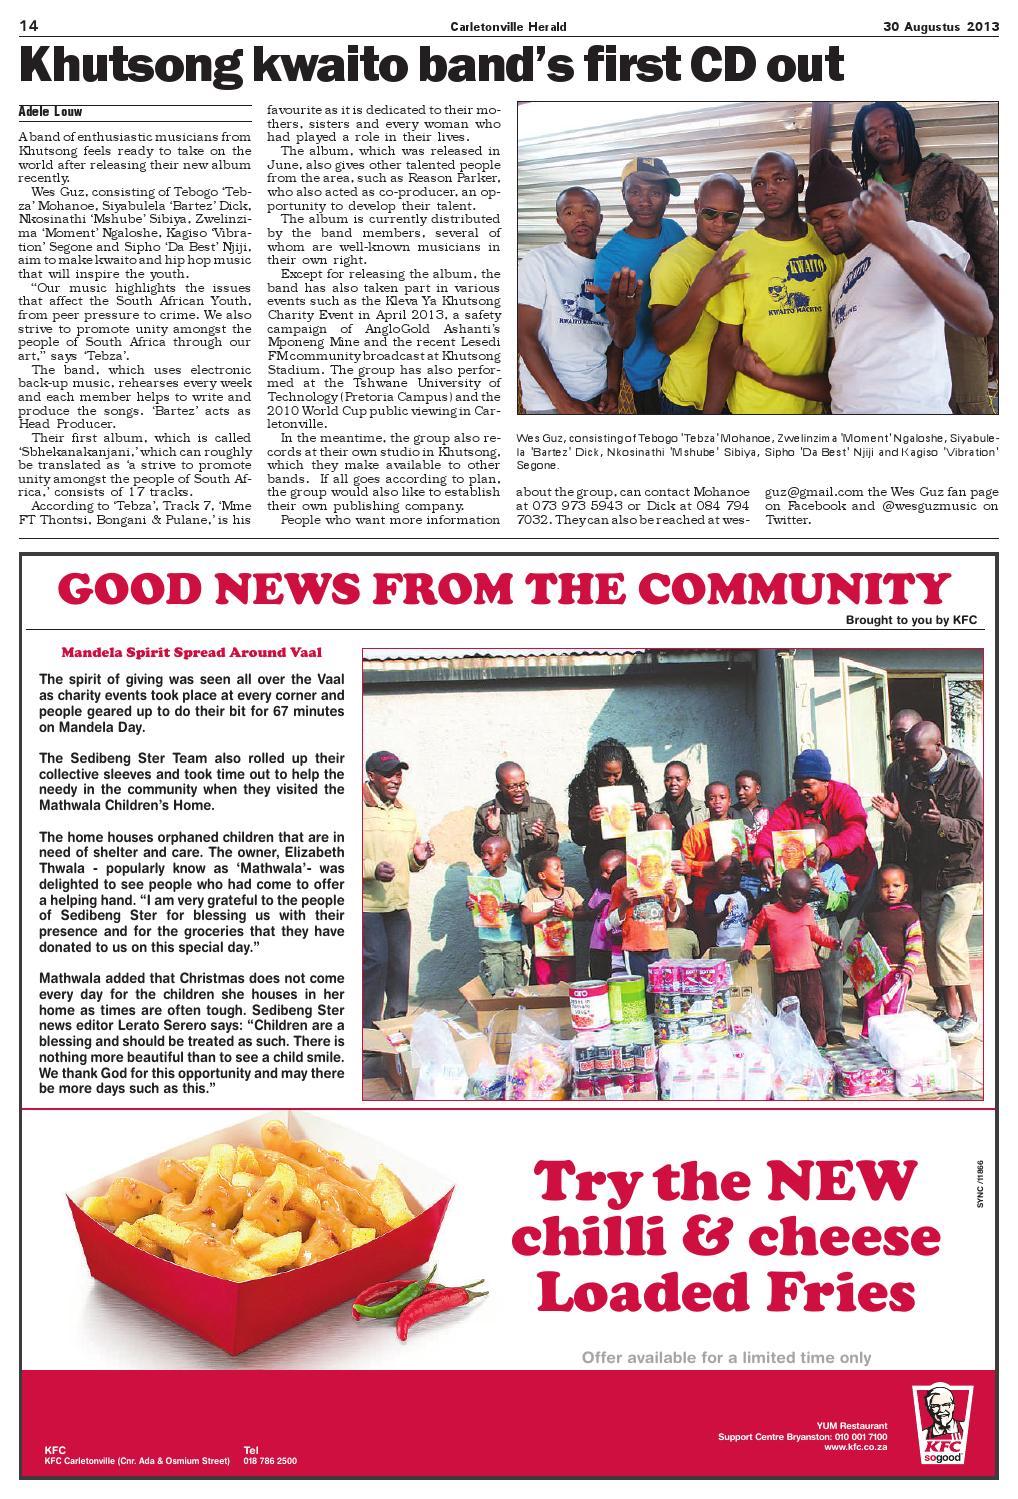 Carltonville Herald 30 Augustus 2013 by Carletonvilleherald - issuu